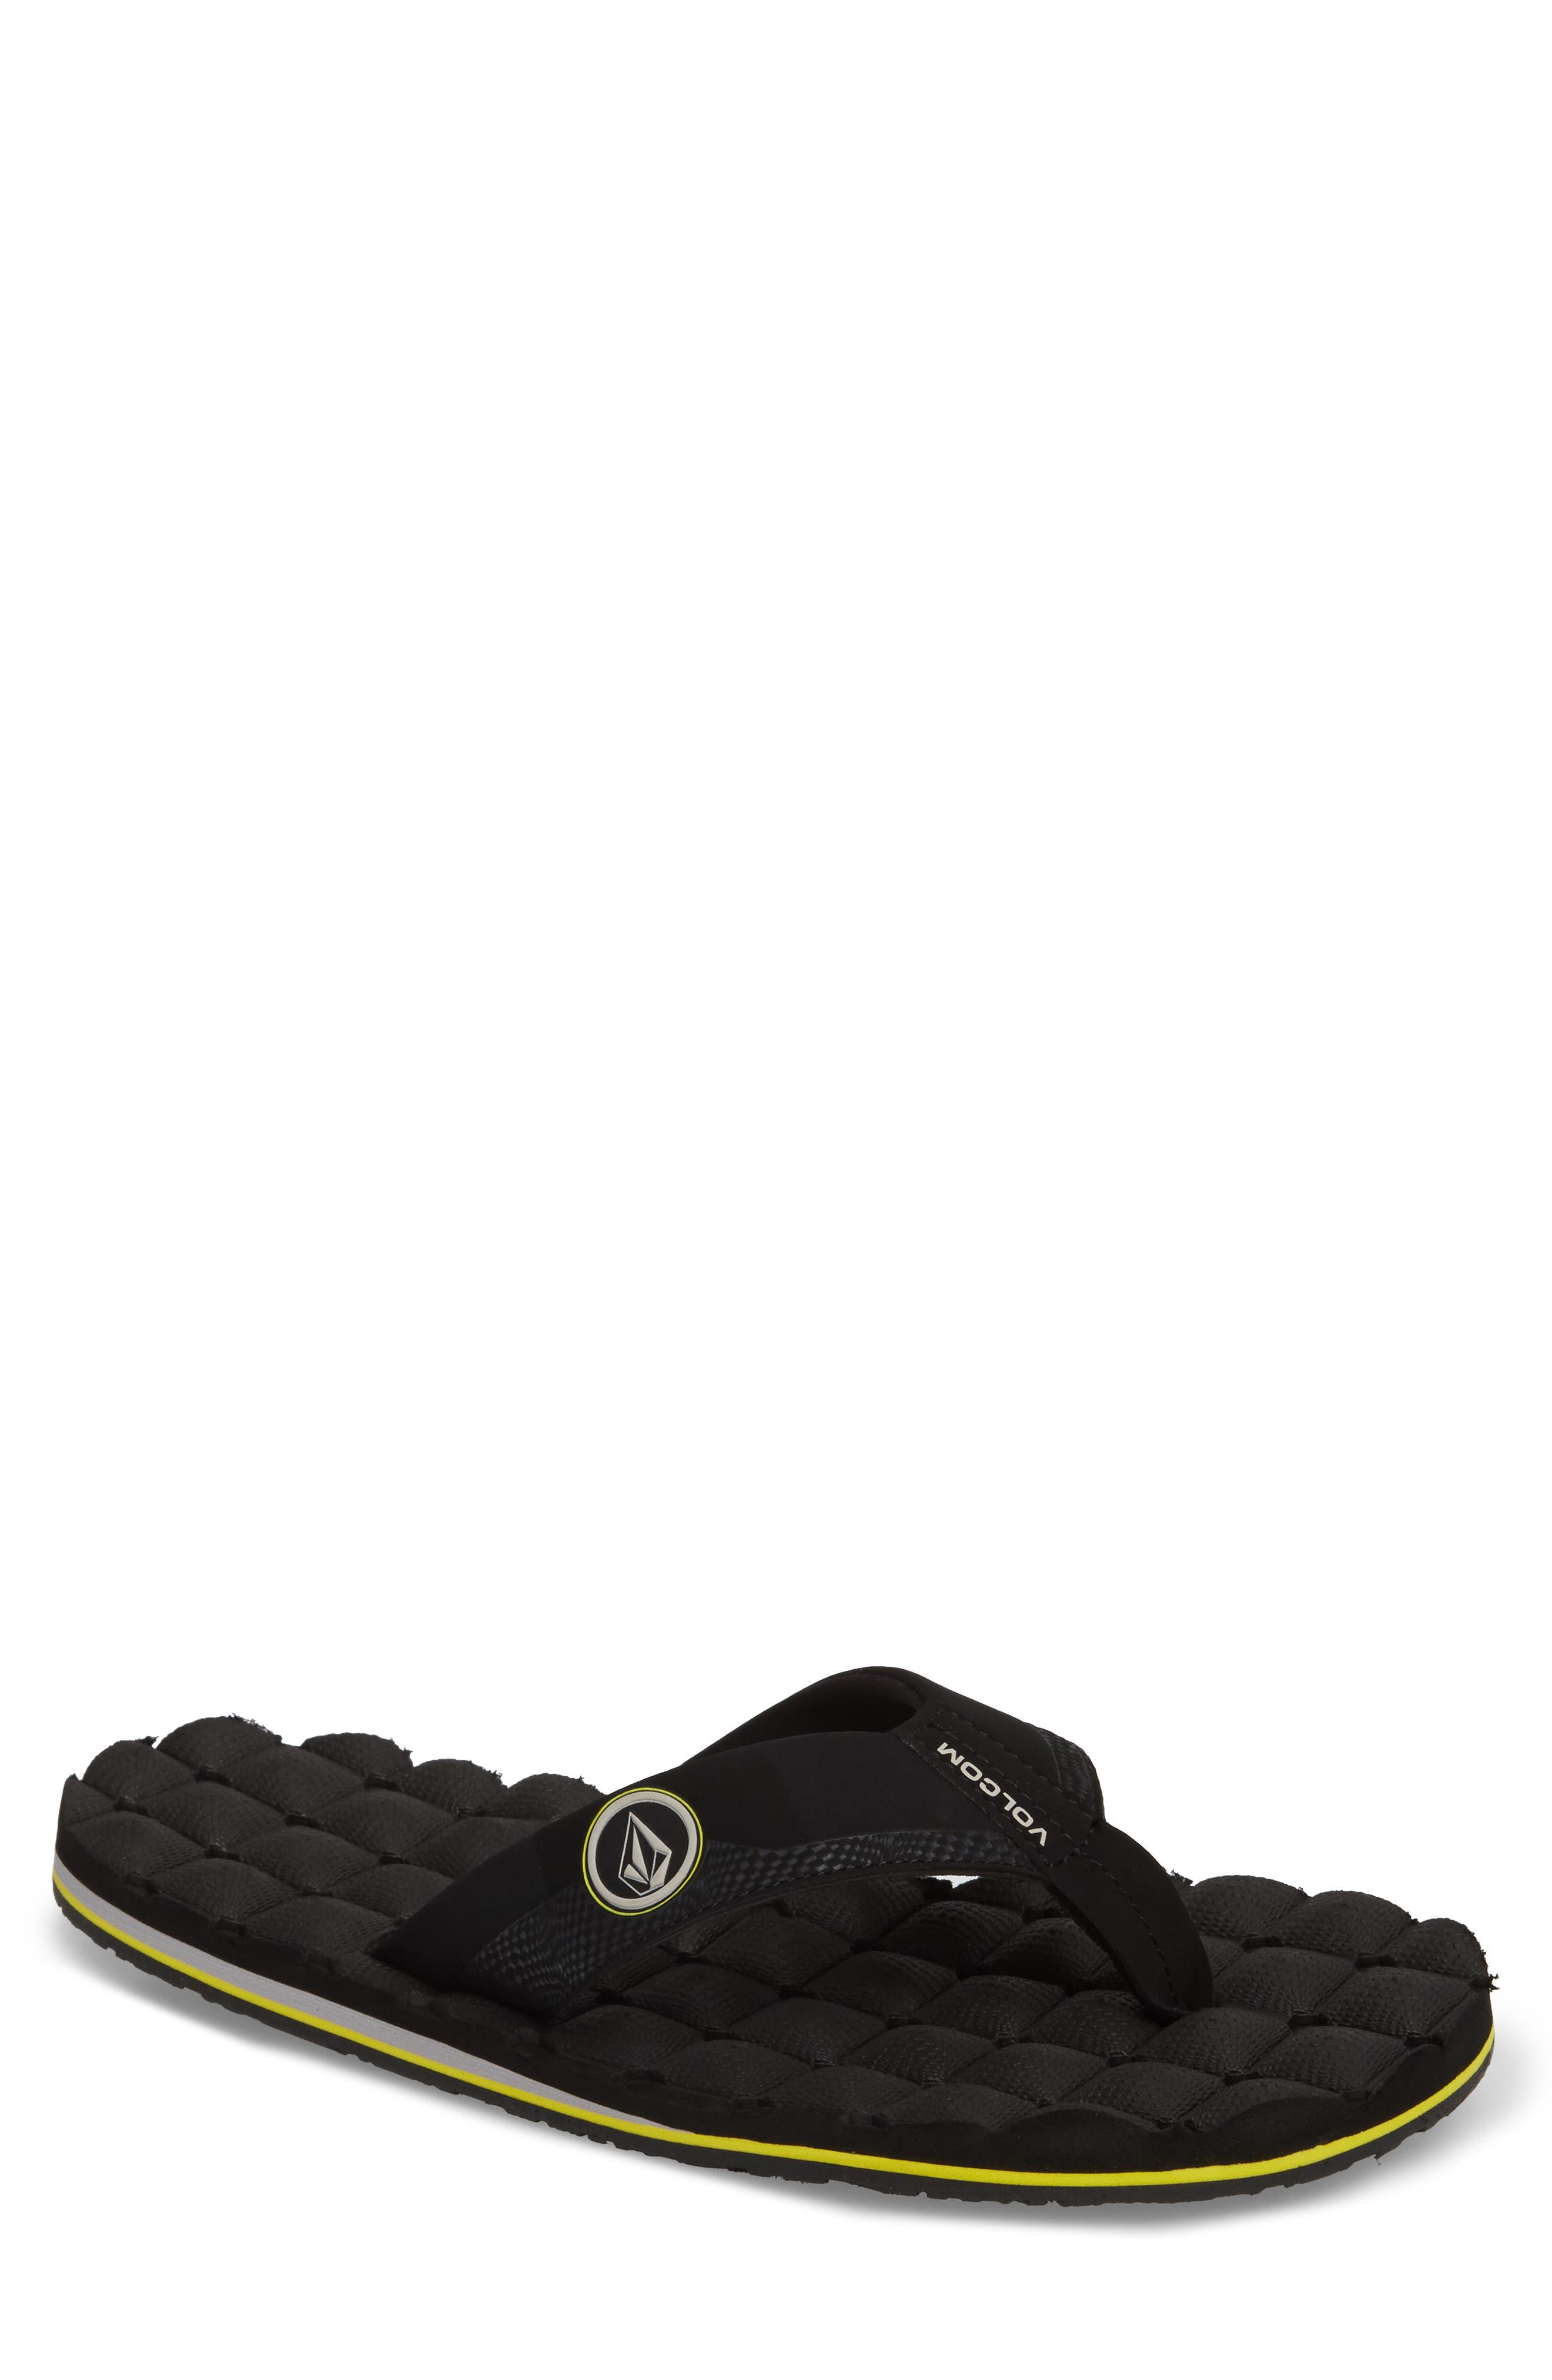 'Recliner' Flip Flop,                         Main,                         color, BLACK